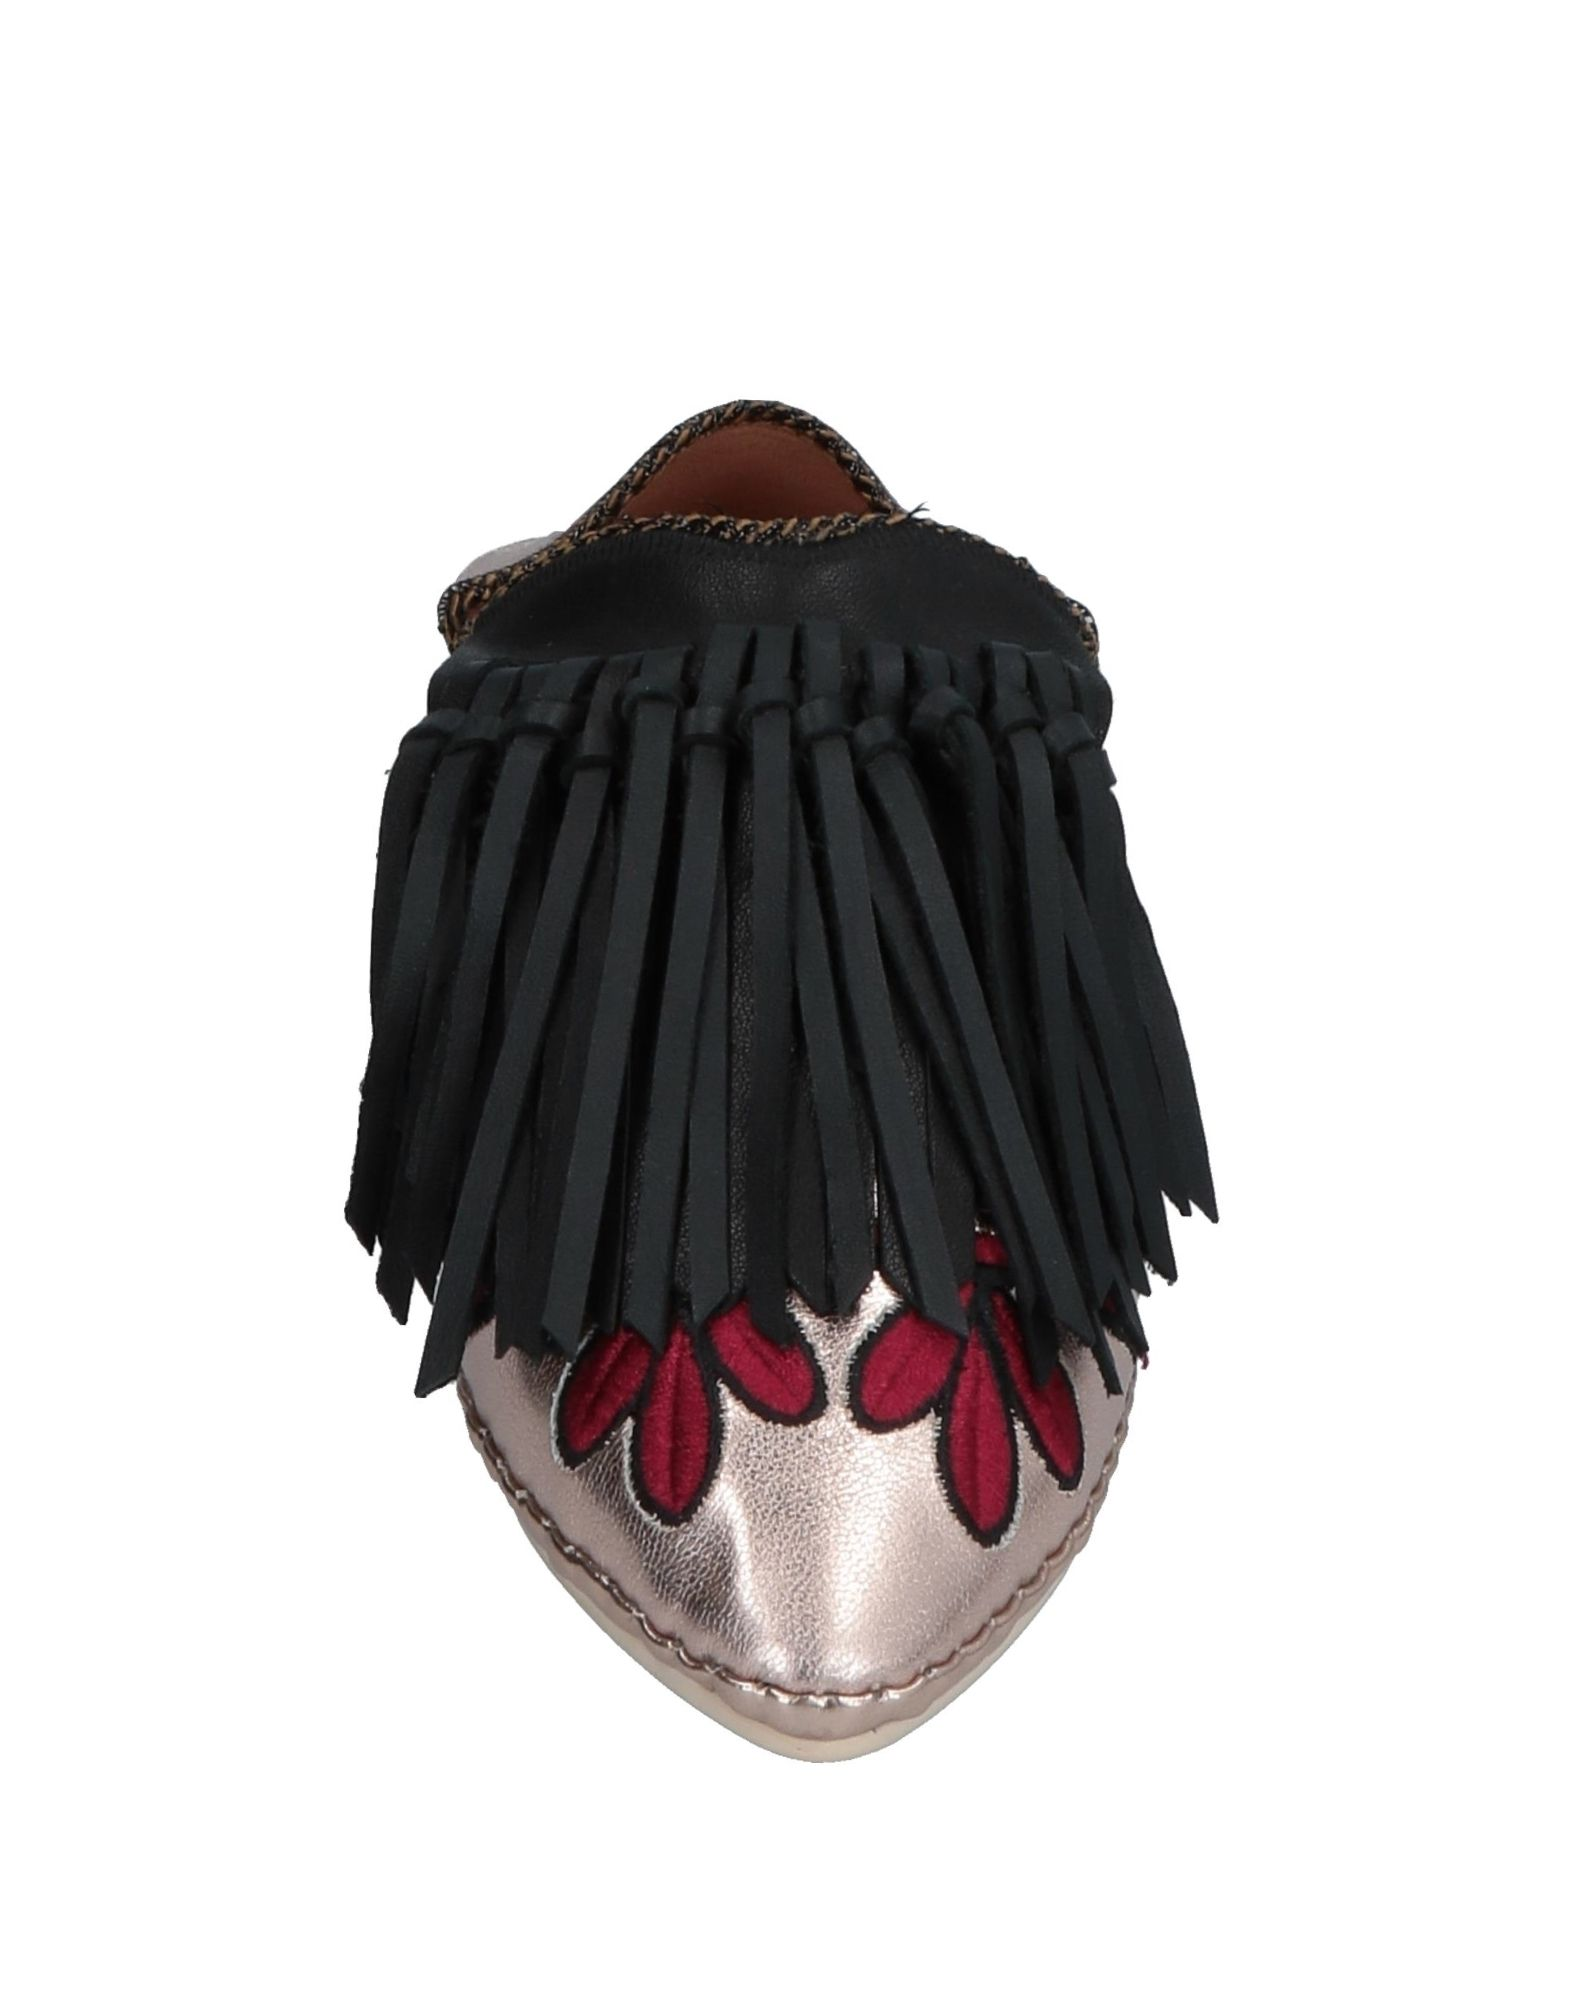 Stilvolle Pantoletten billige Schuhe Maison Scotch Pantoletten Stilvolle Damen  11577045UG 88a158